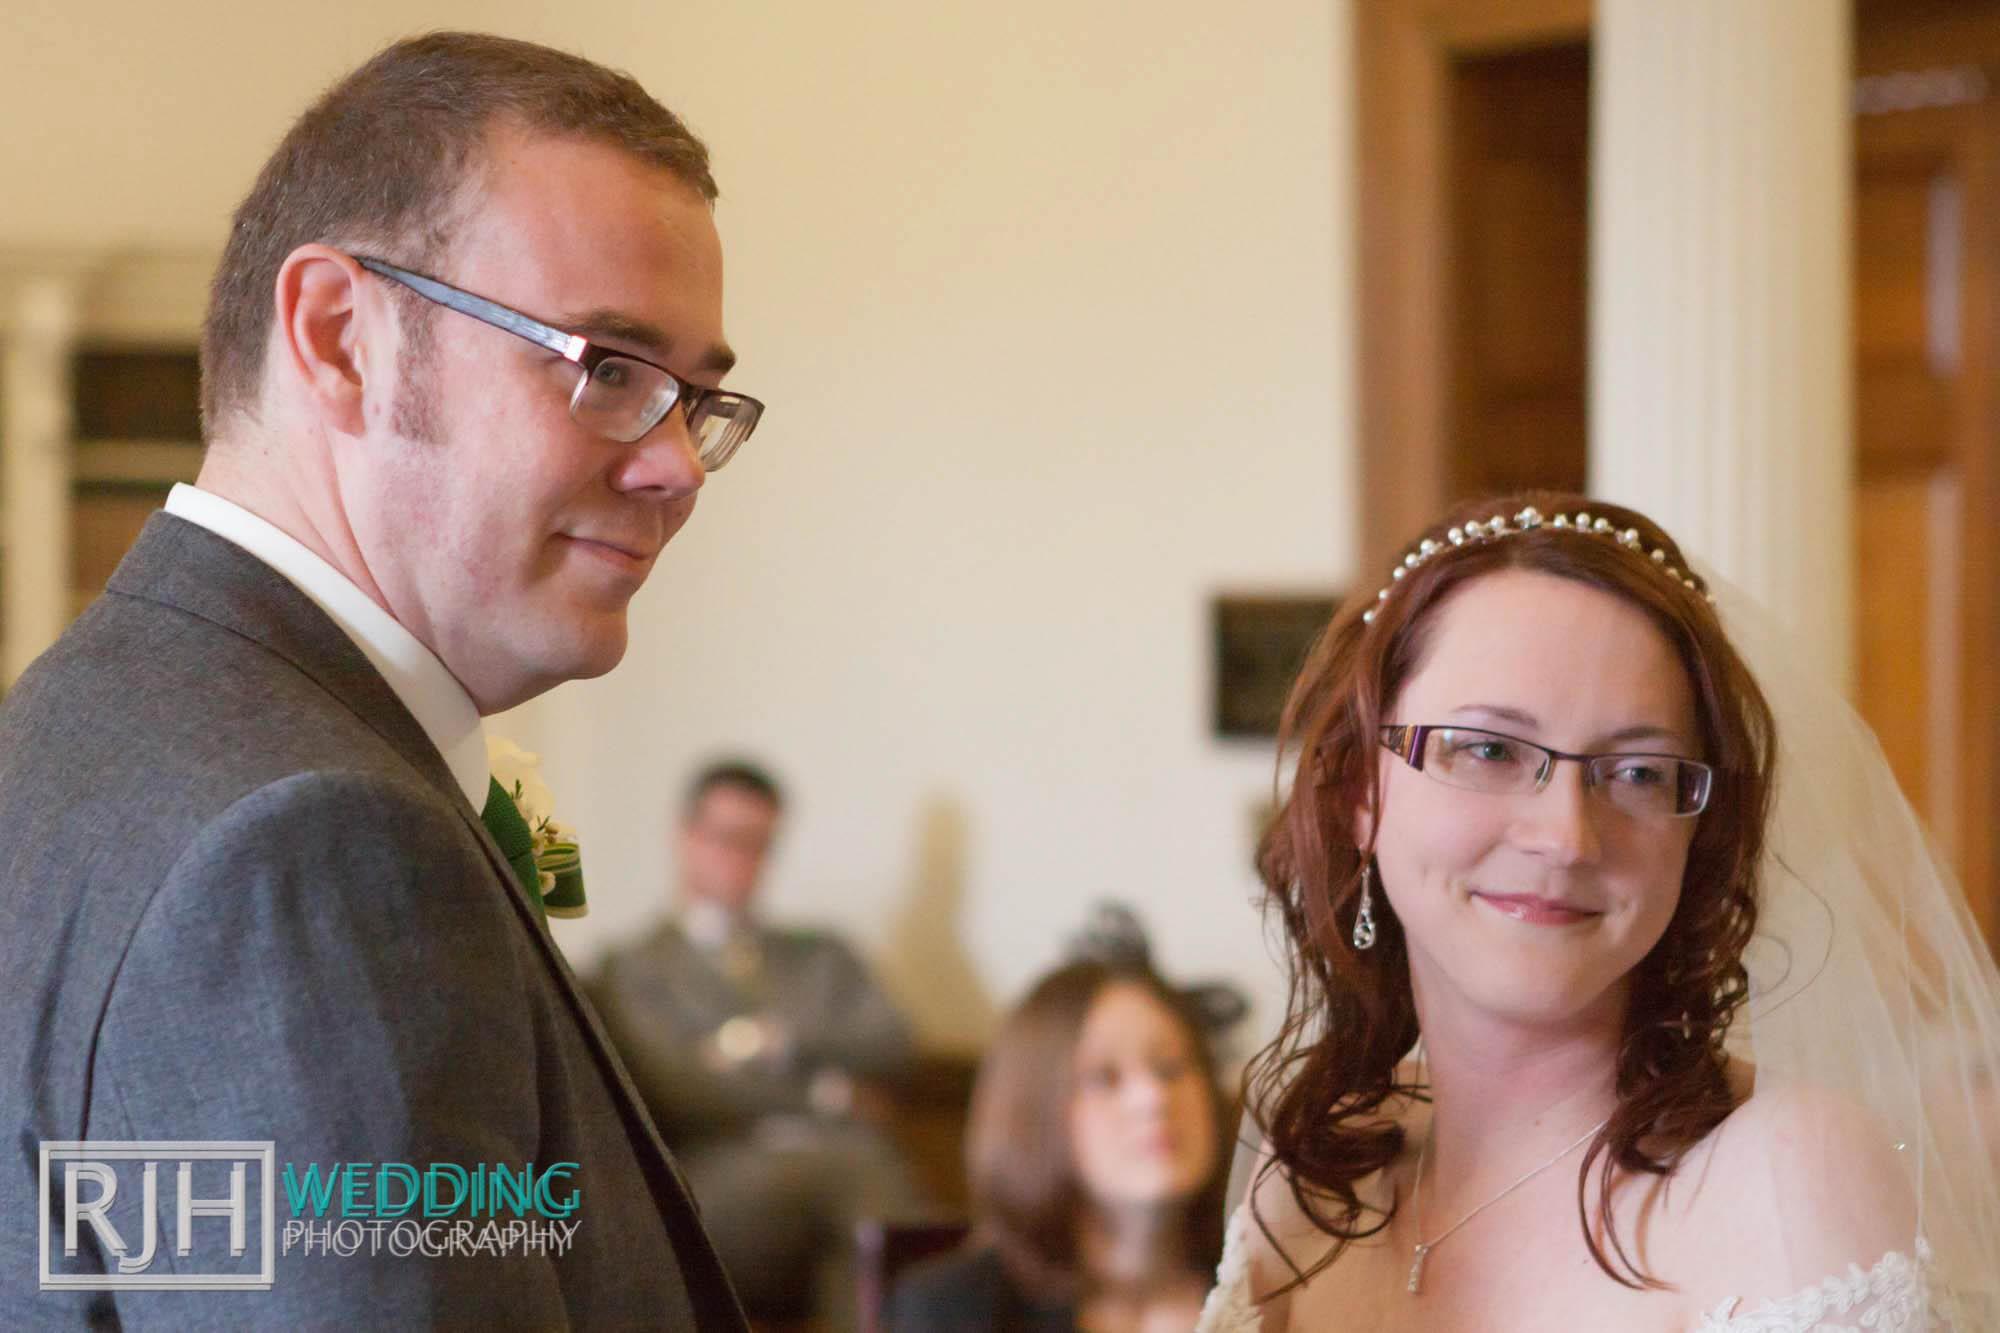 RJH Wedding Photography_2014 highlights_04.jpg